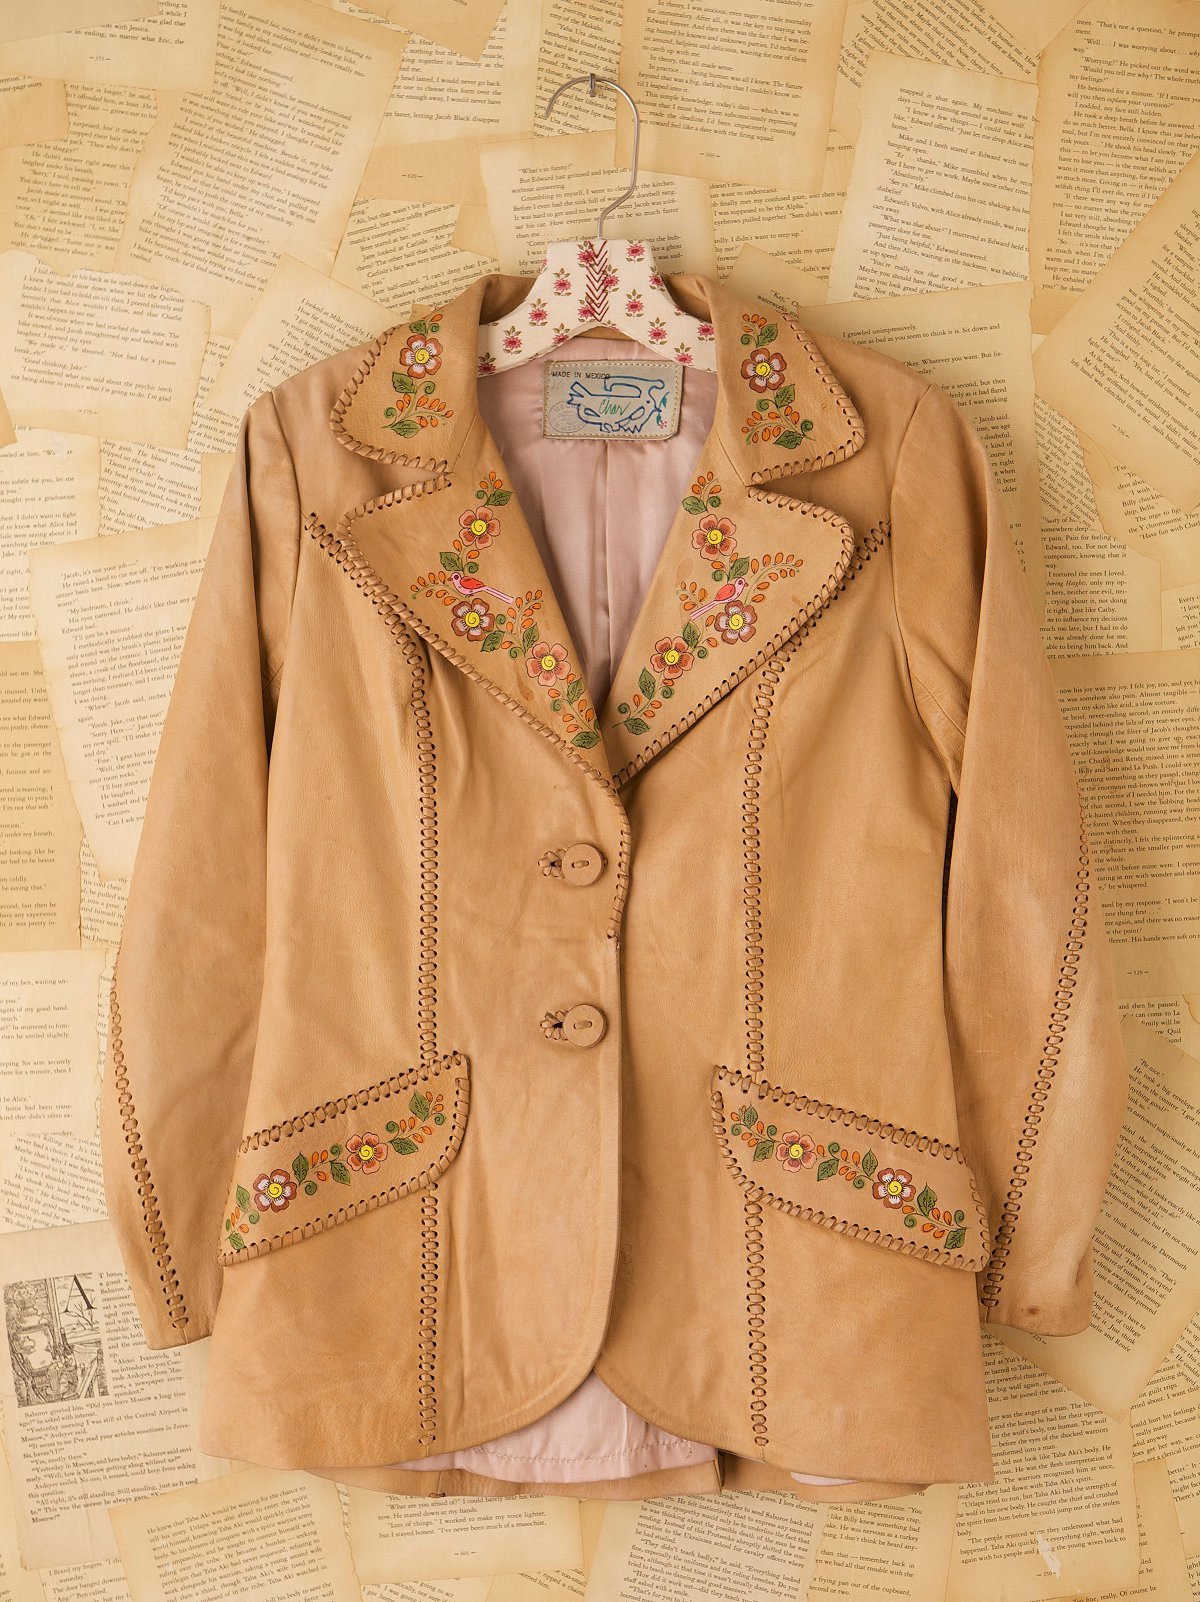 Vintage Hand Painted Leather Jacket